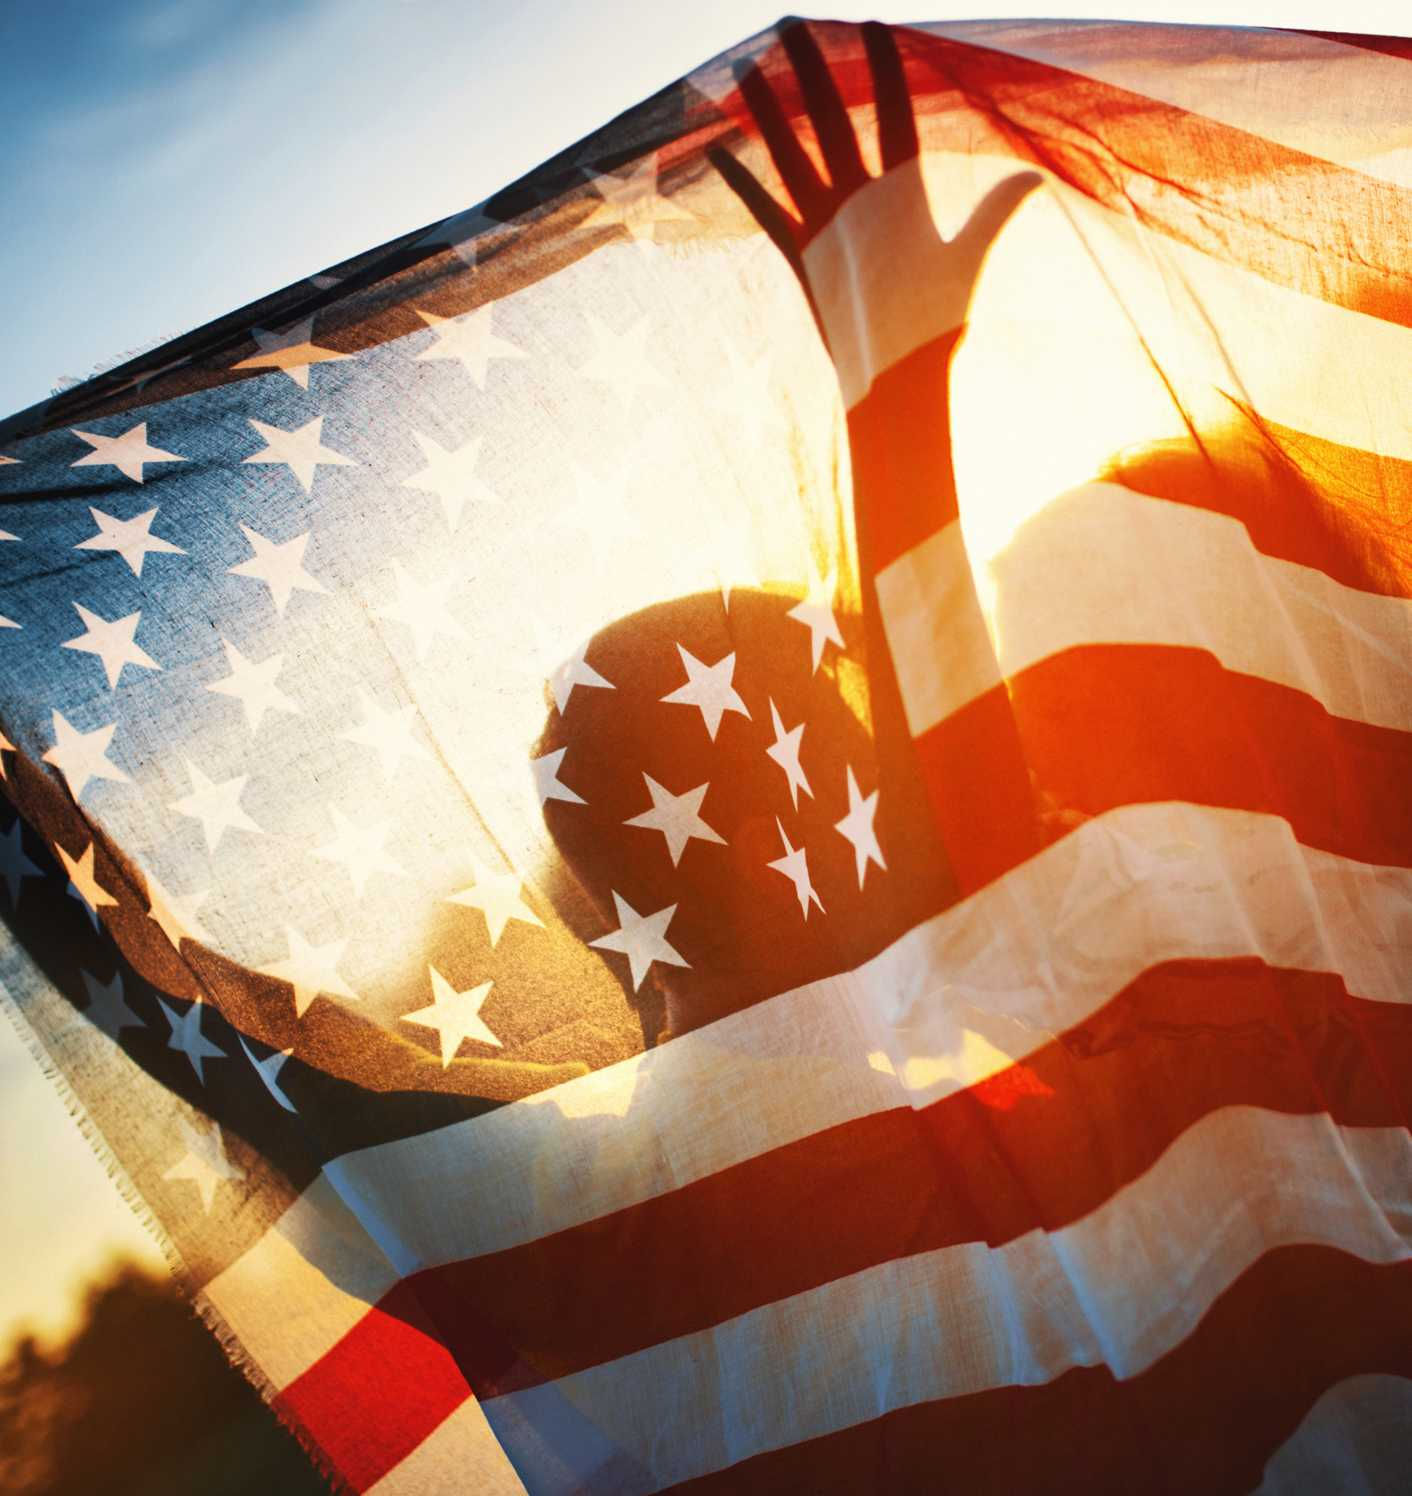 Image representing US Flag